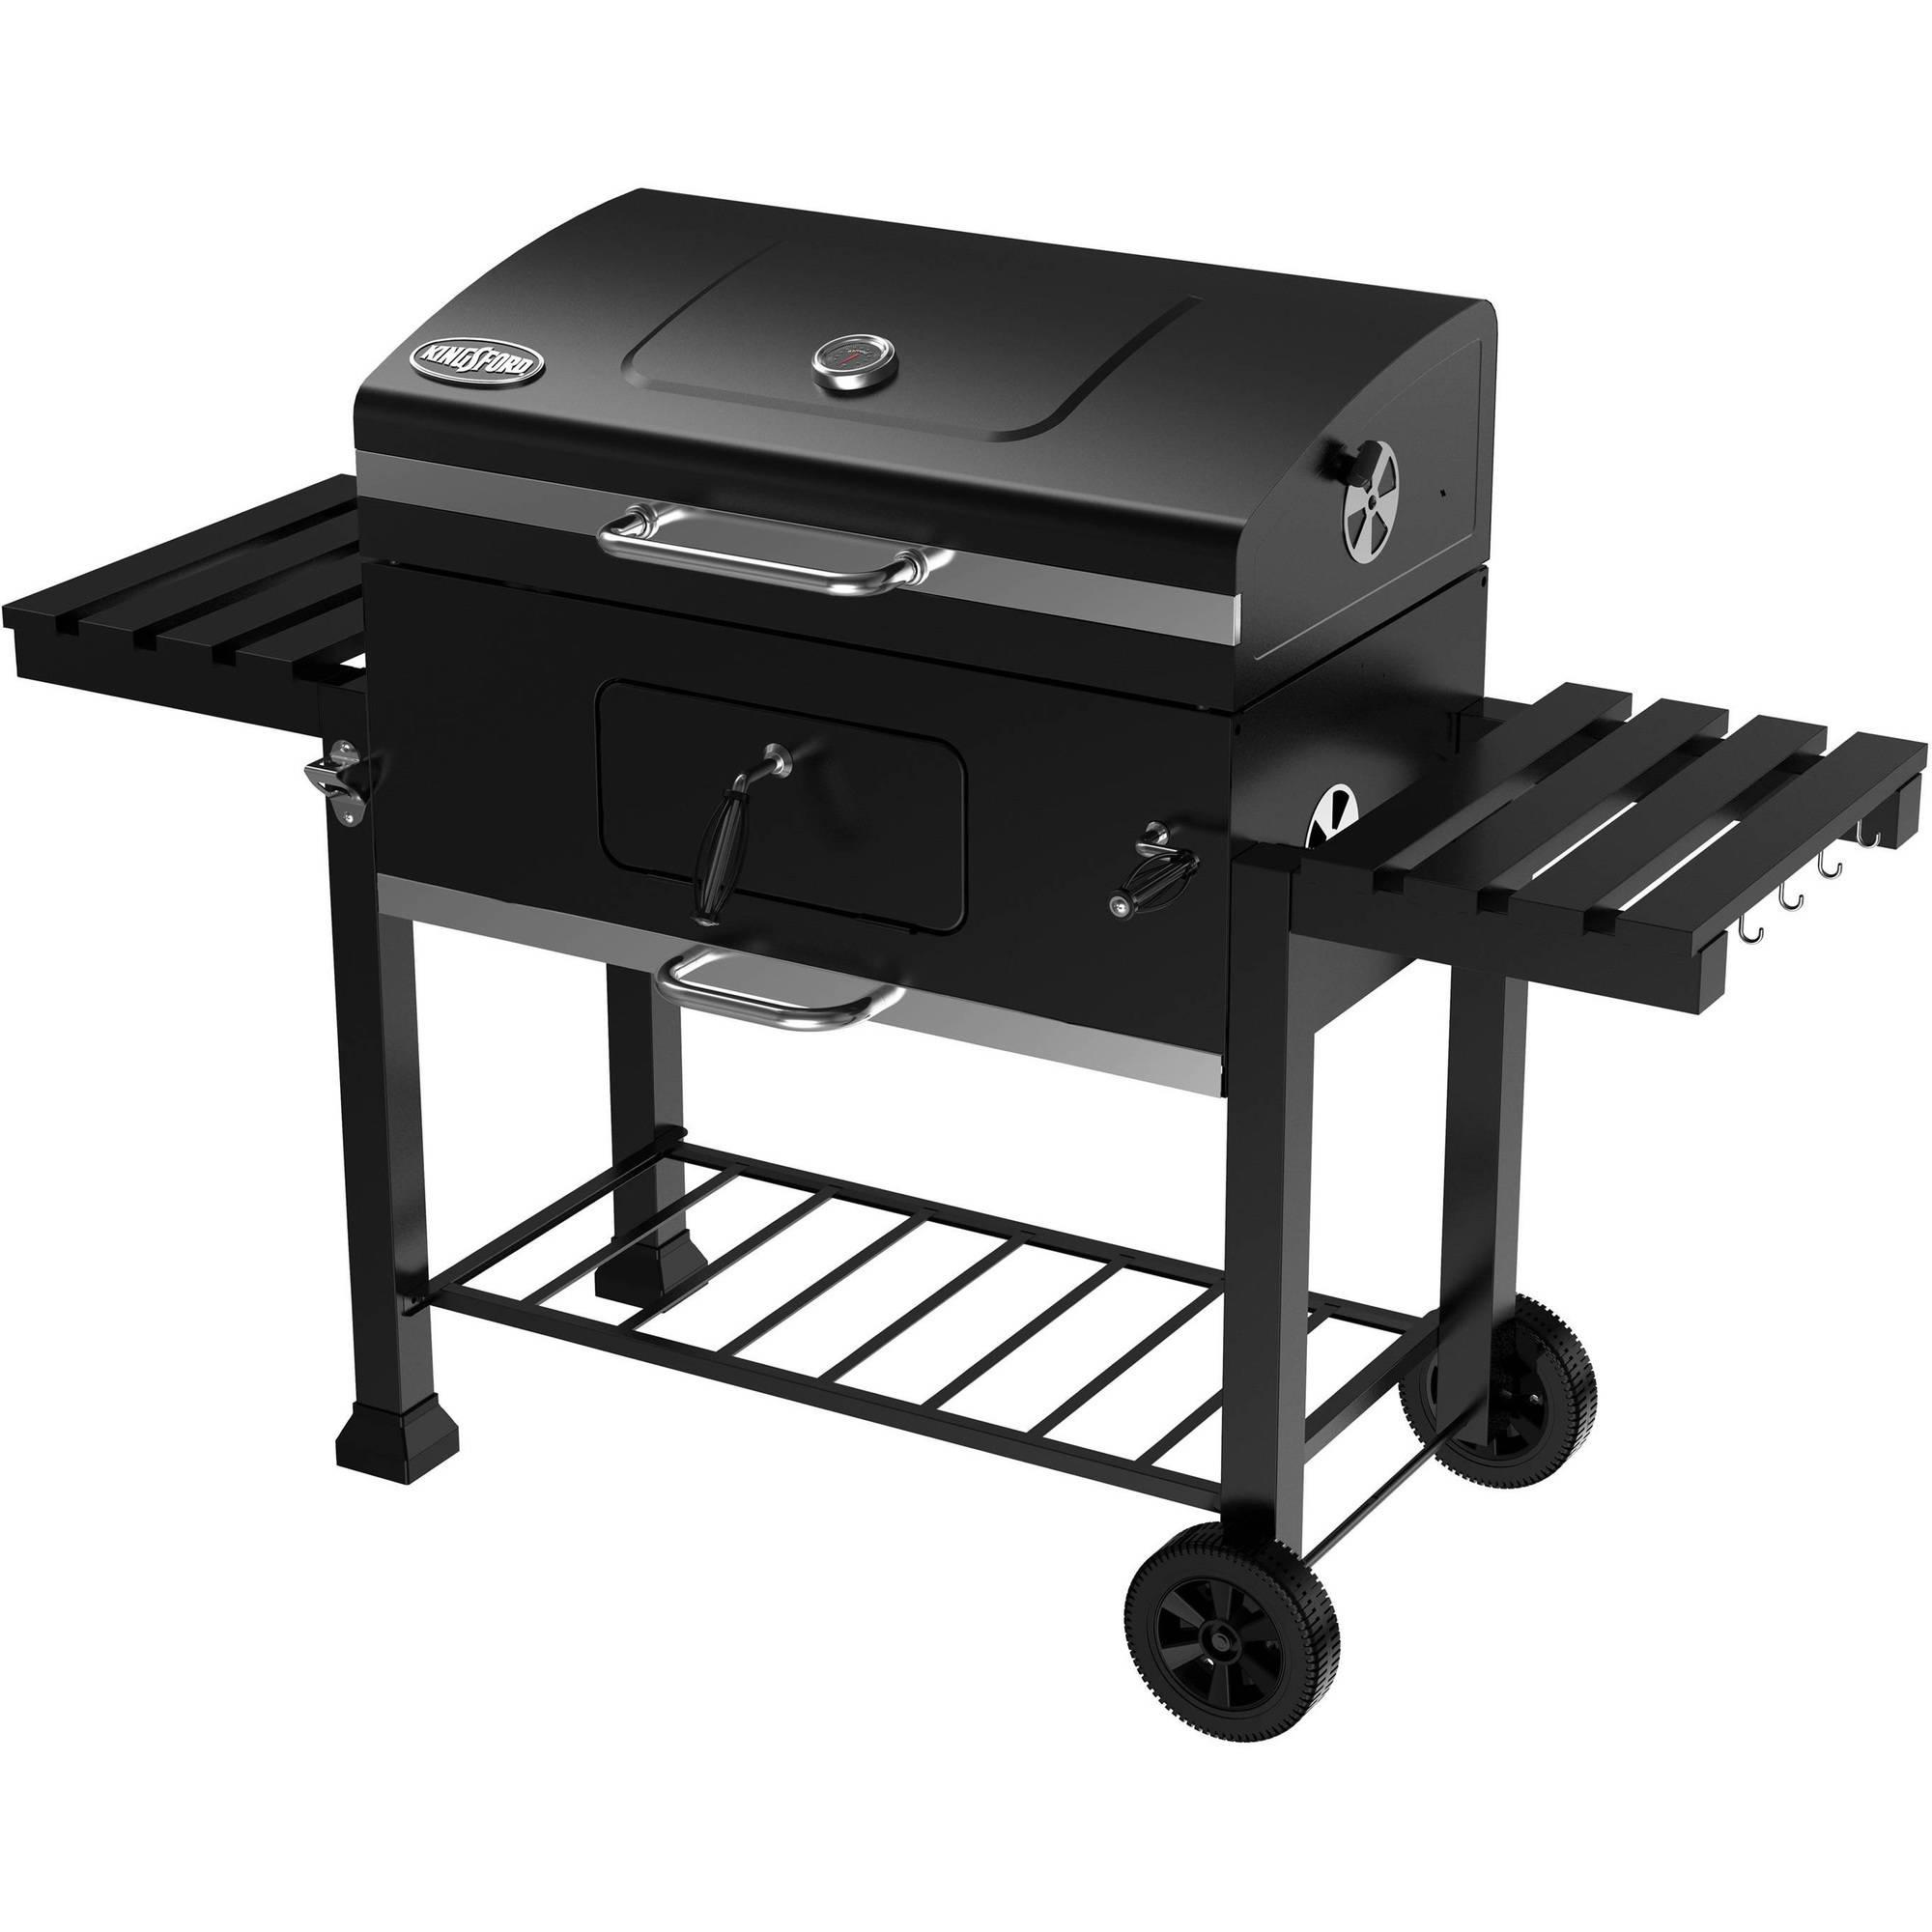 barbecue grill kingsford 32 PKAIGML